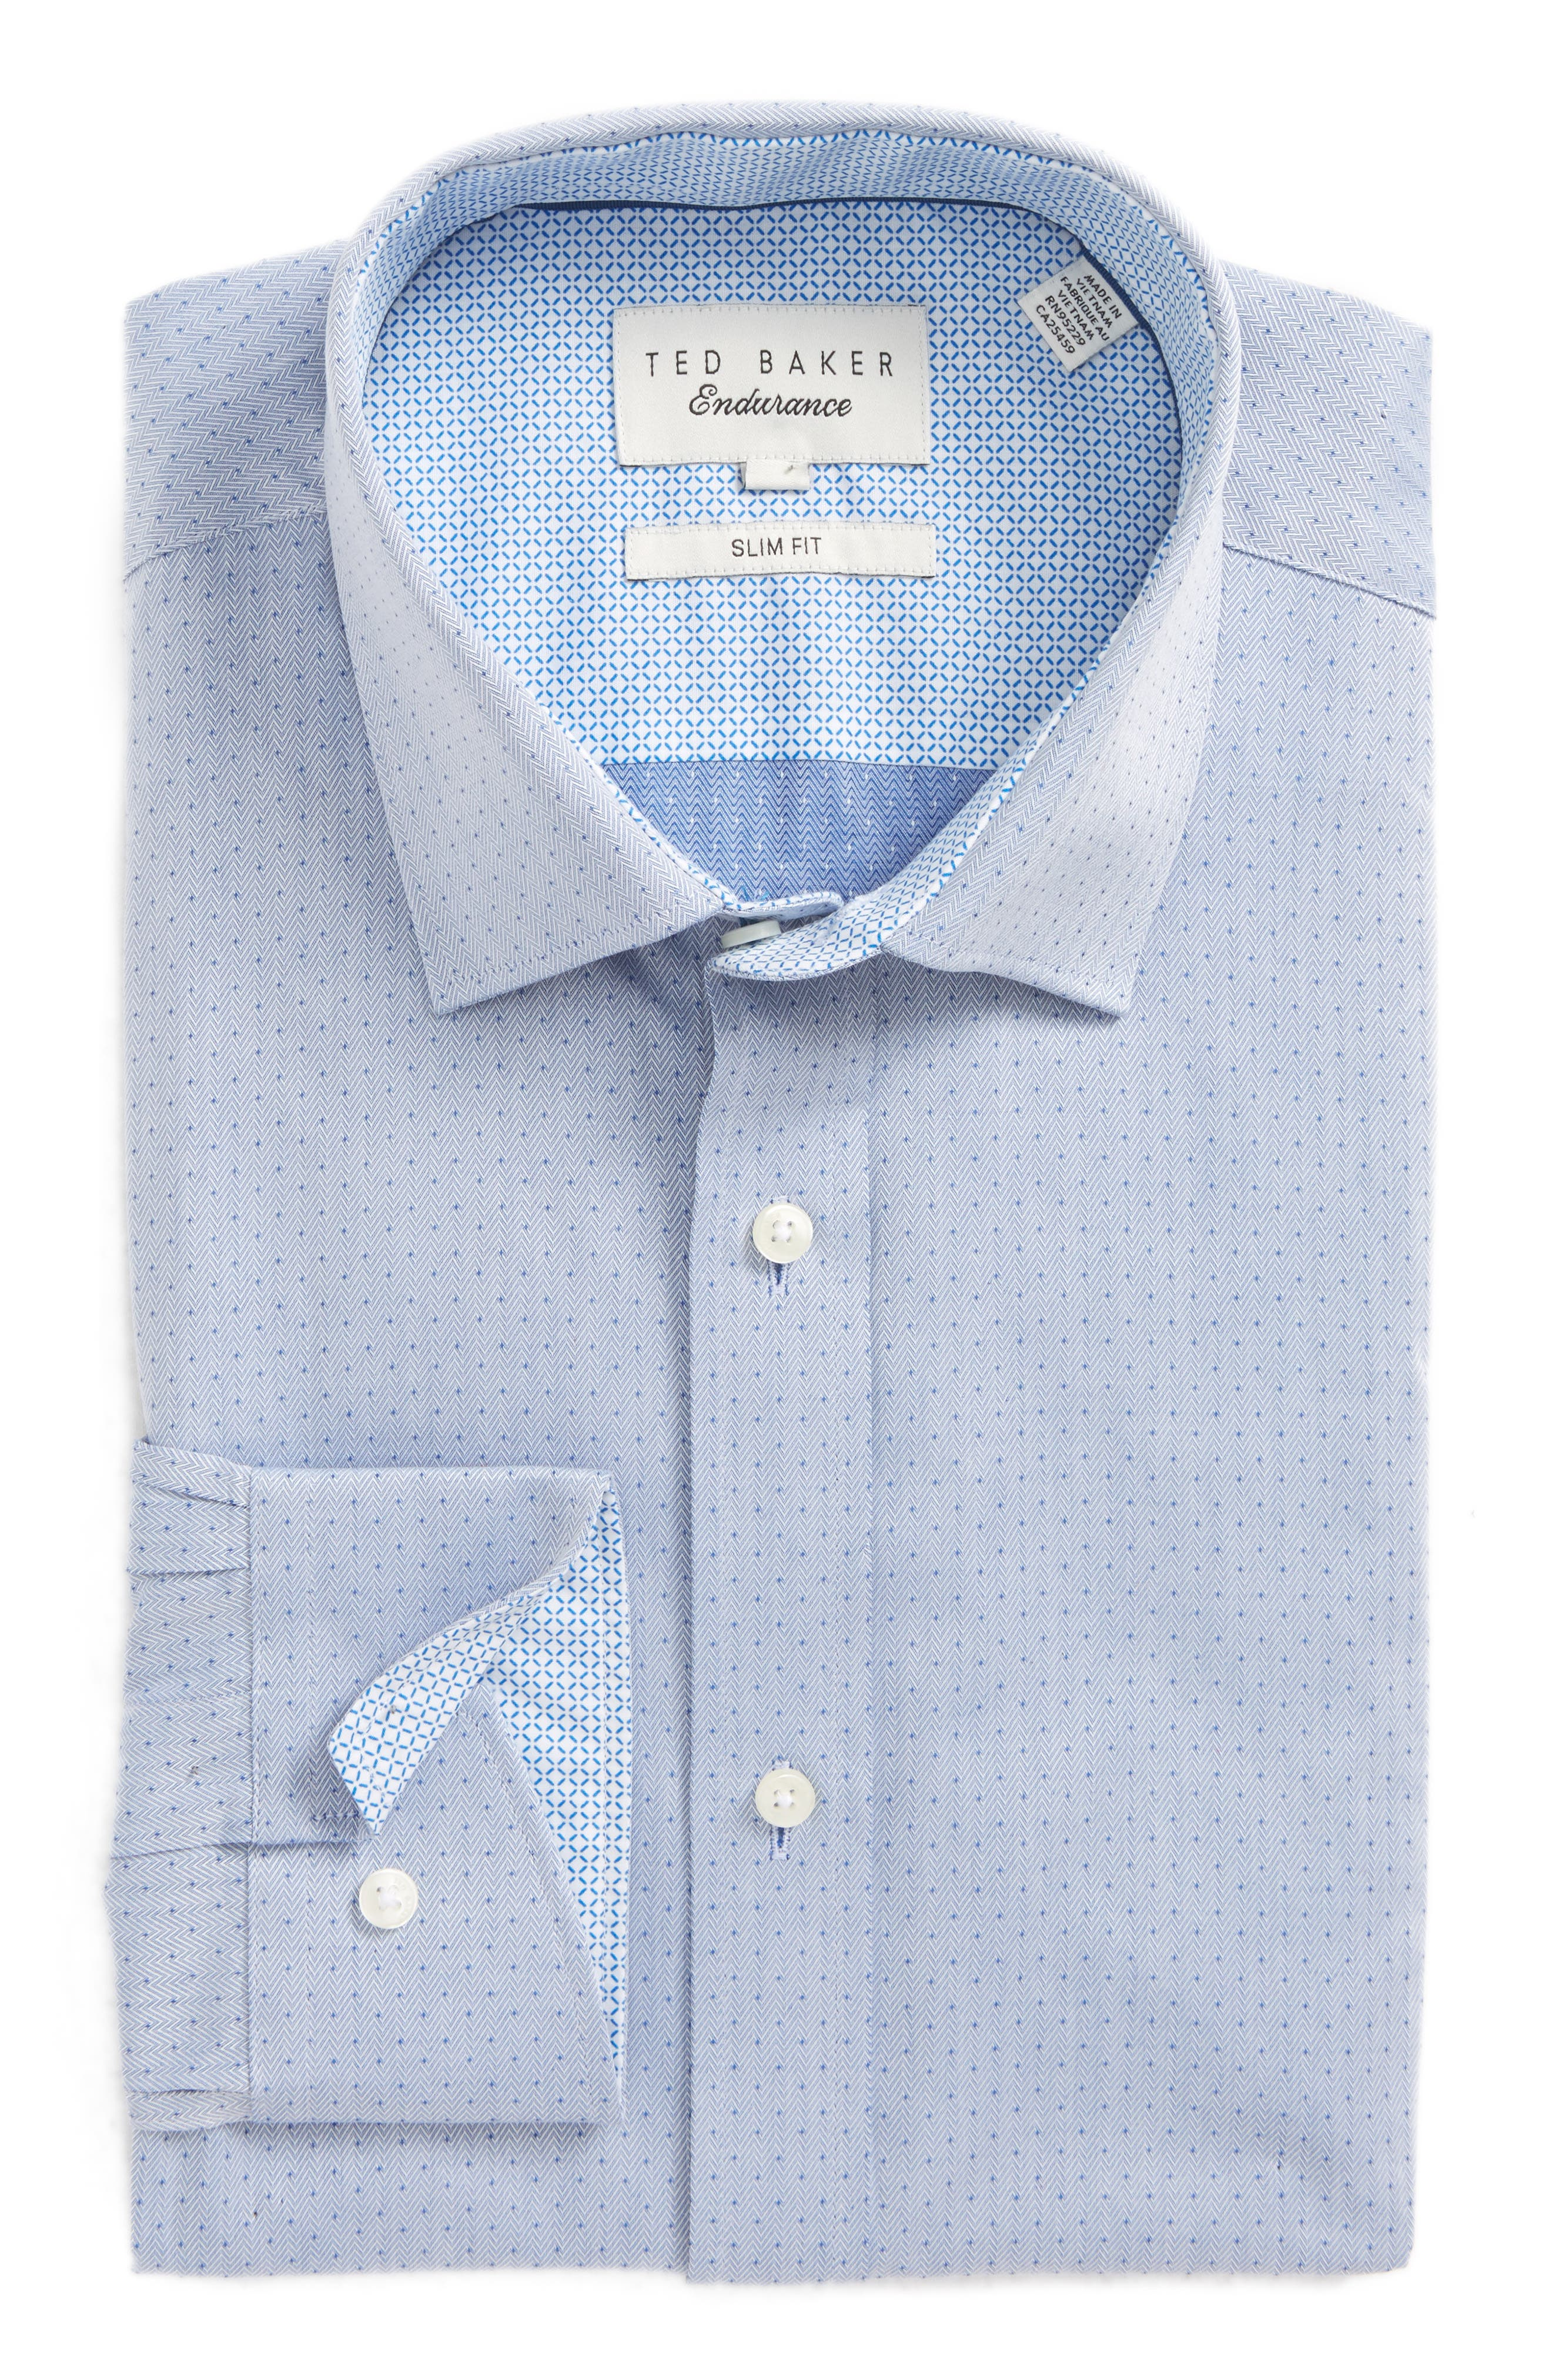 Boxli Trim Fit Herringbone Dress Shirt,                             Main thumbnail 1, color,                             Blue